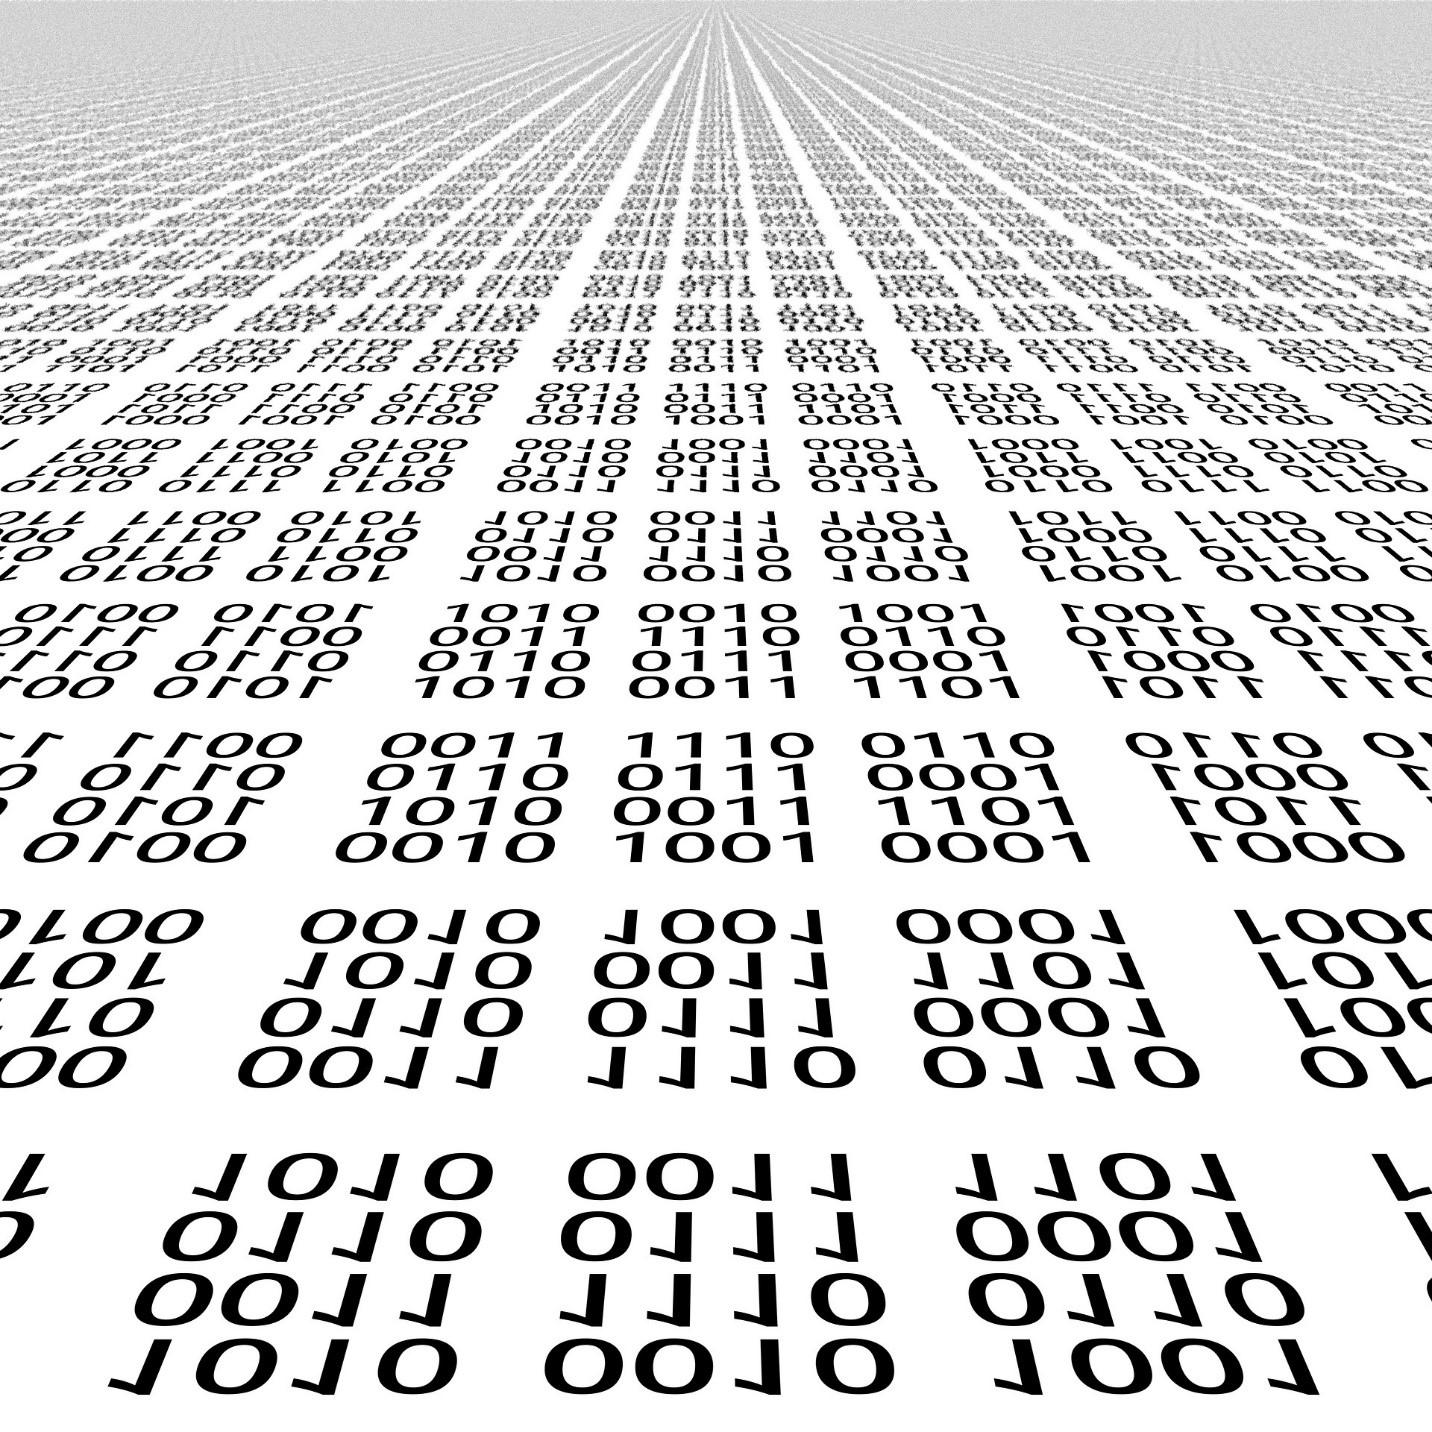 Data Stock Image